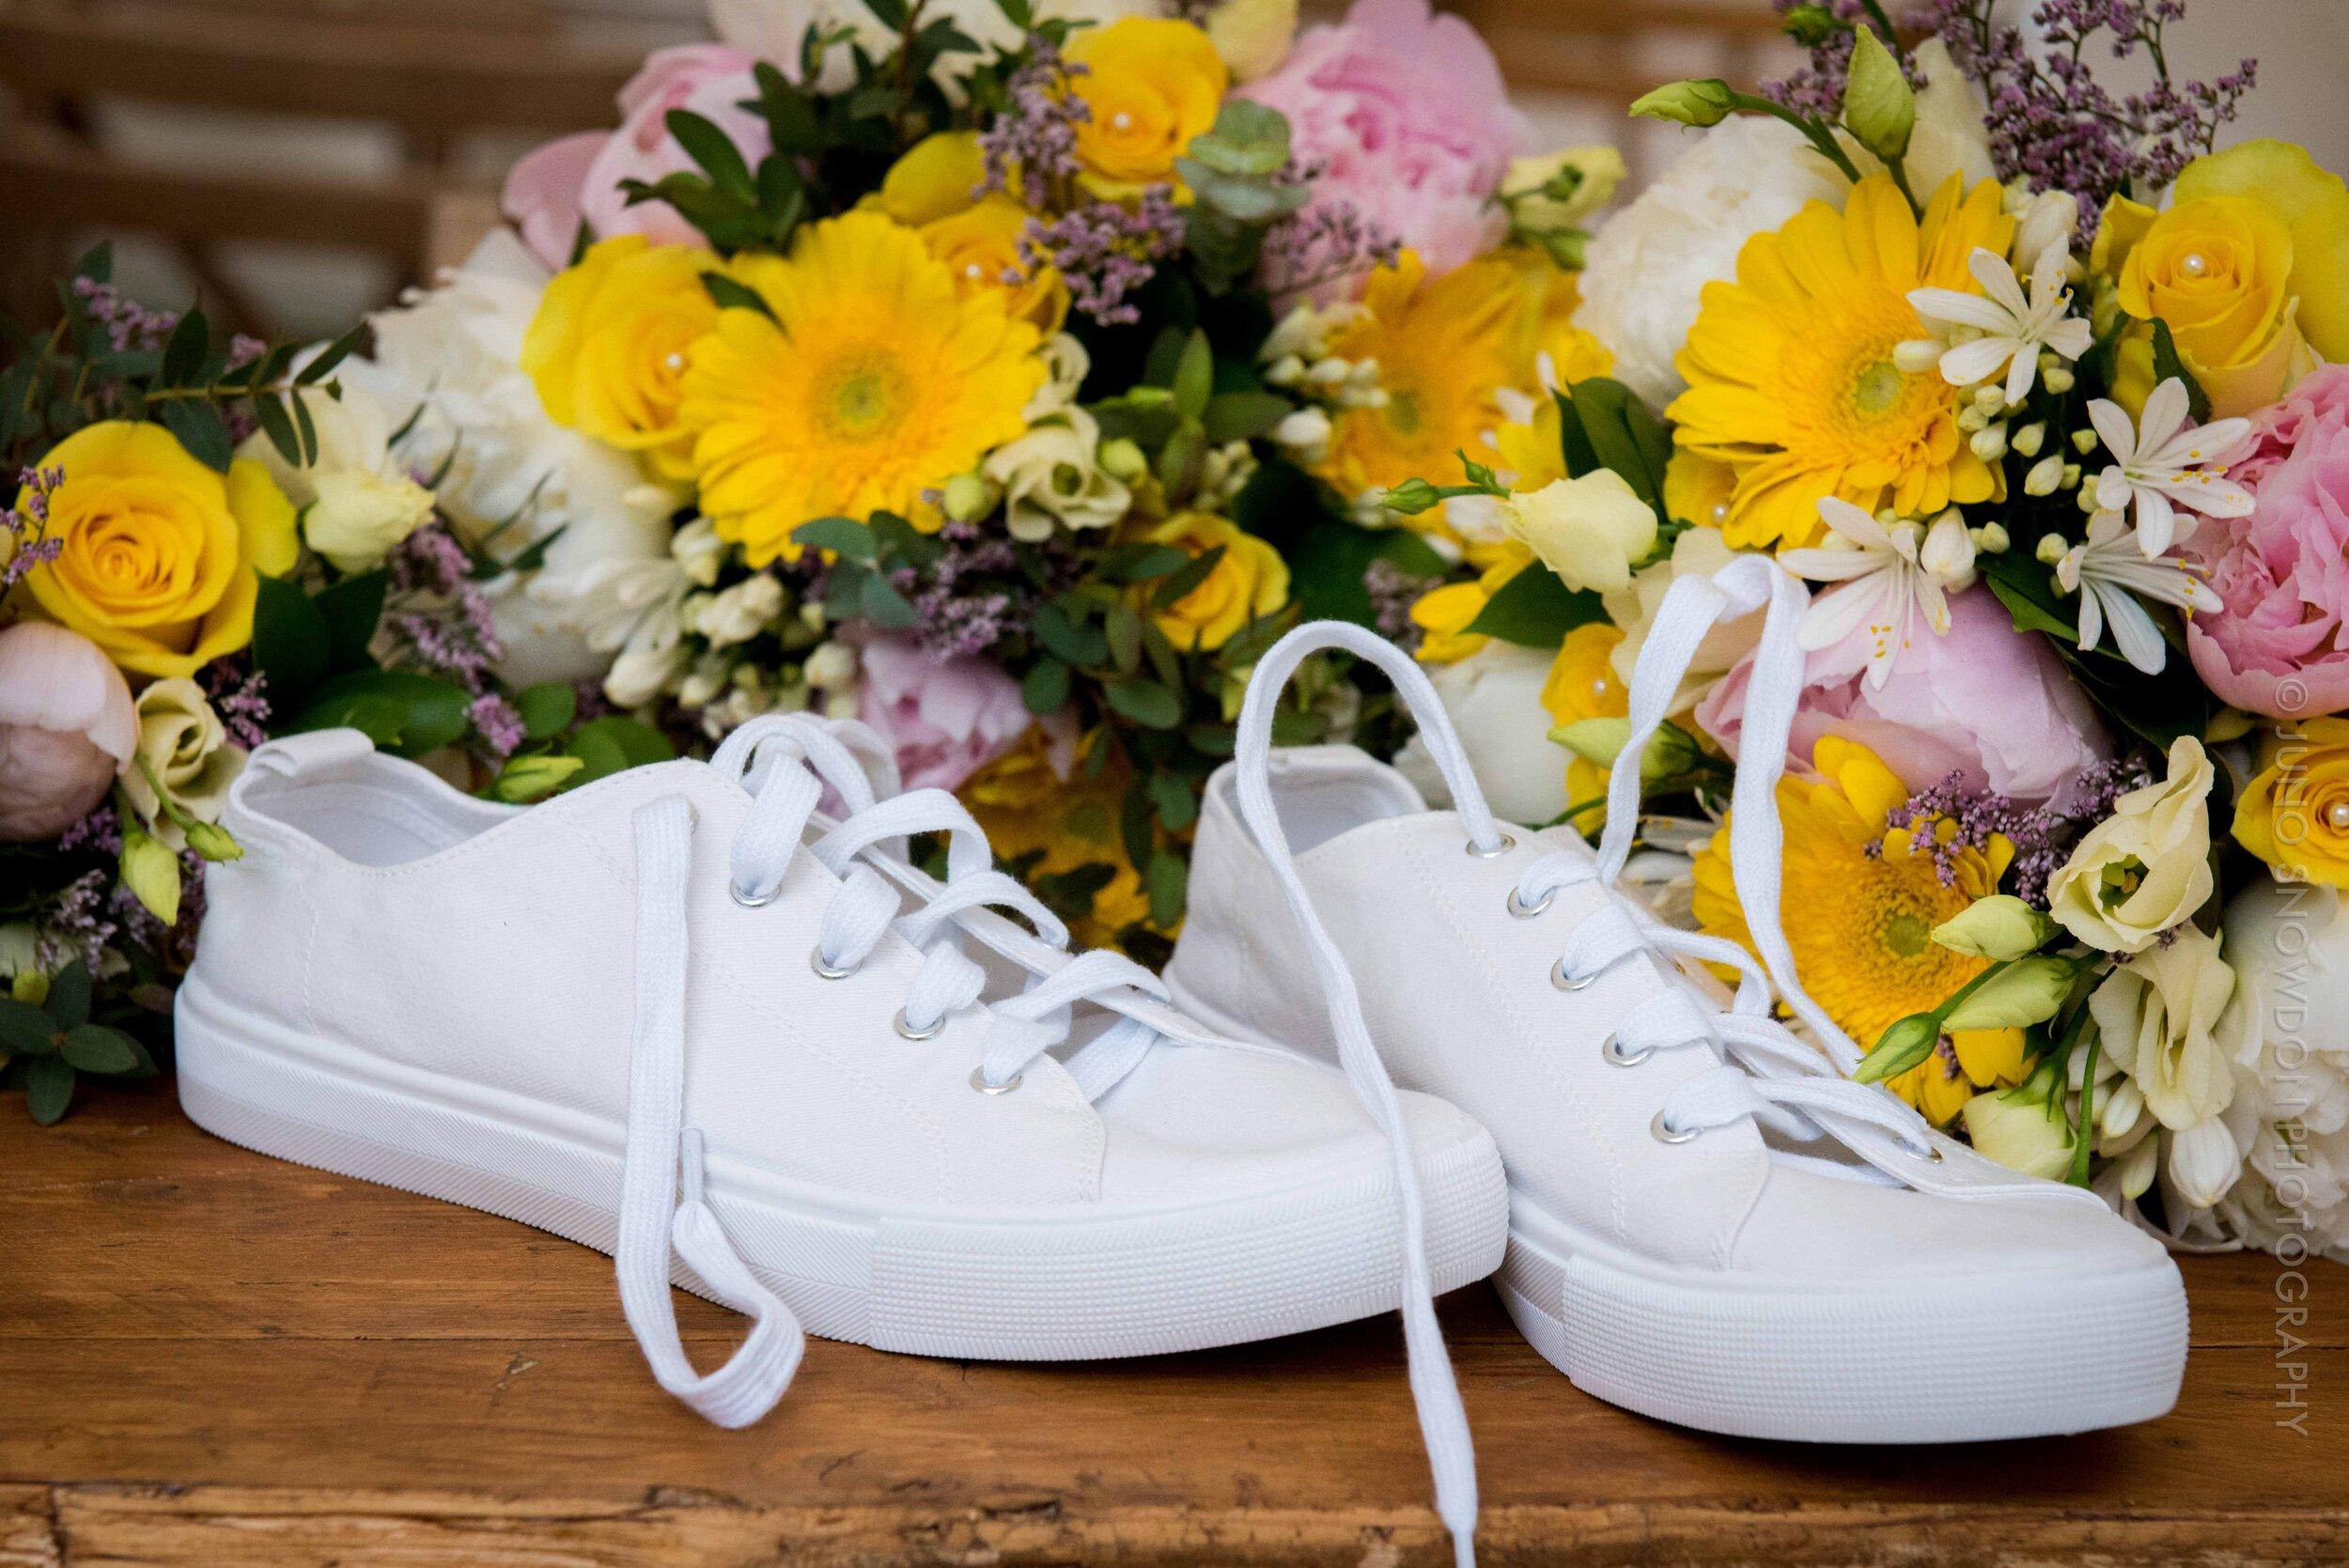 juno-snowdon-photography-wedding-7054.jpg